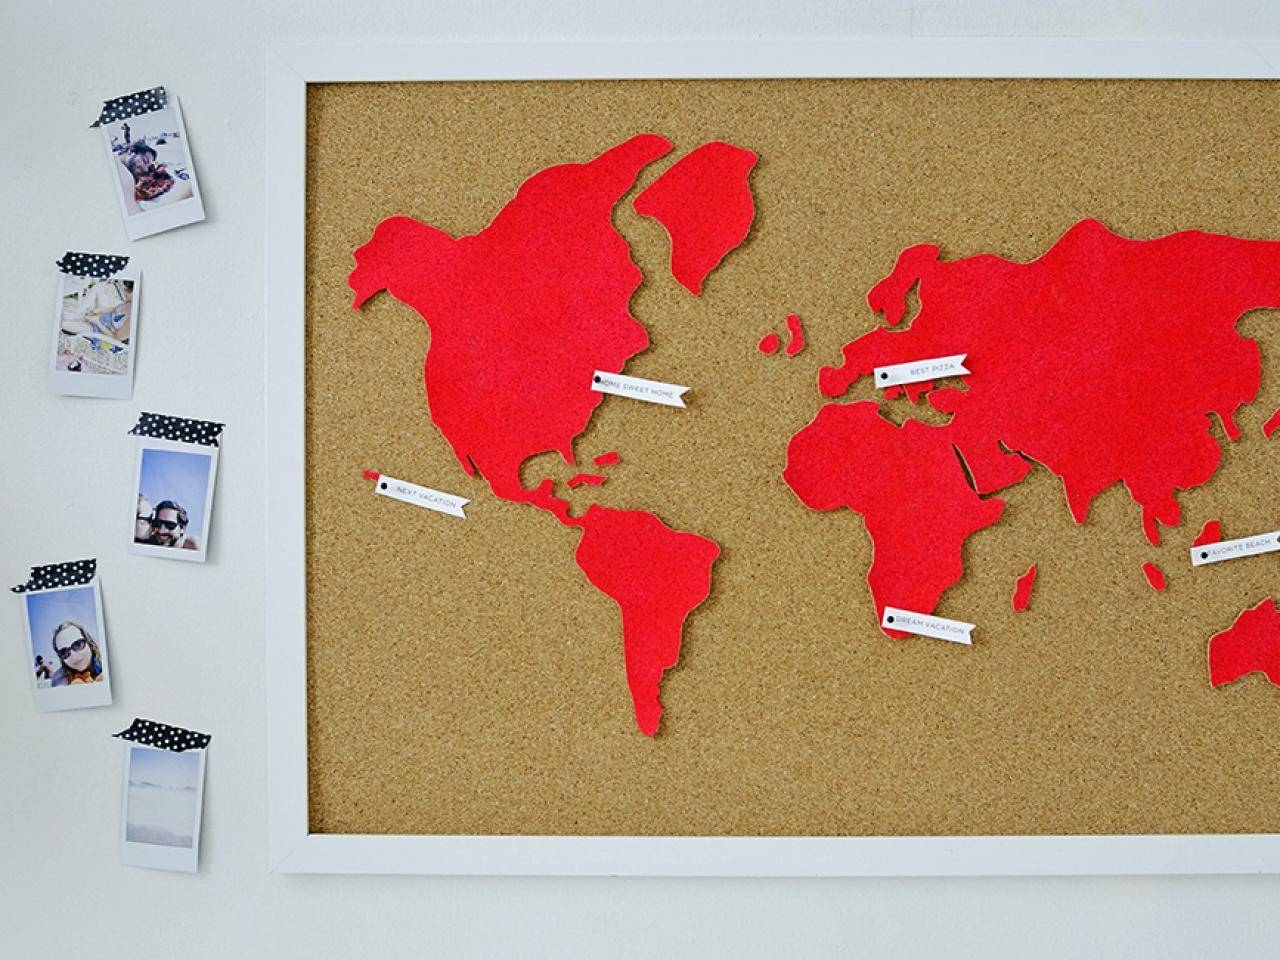 Diy Wall Art: Make A Custom Corkboard World Map | Hgtv With Current Custom Map Wall Art (View 18 of 20)